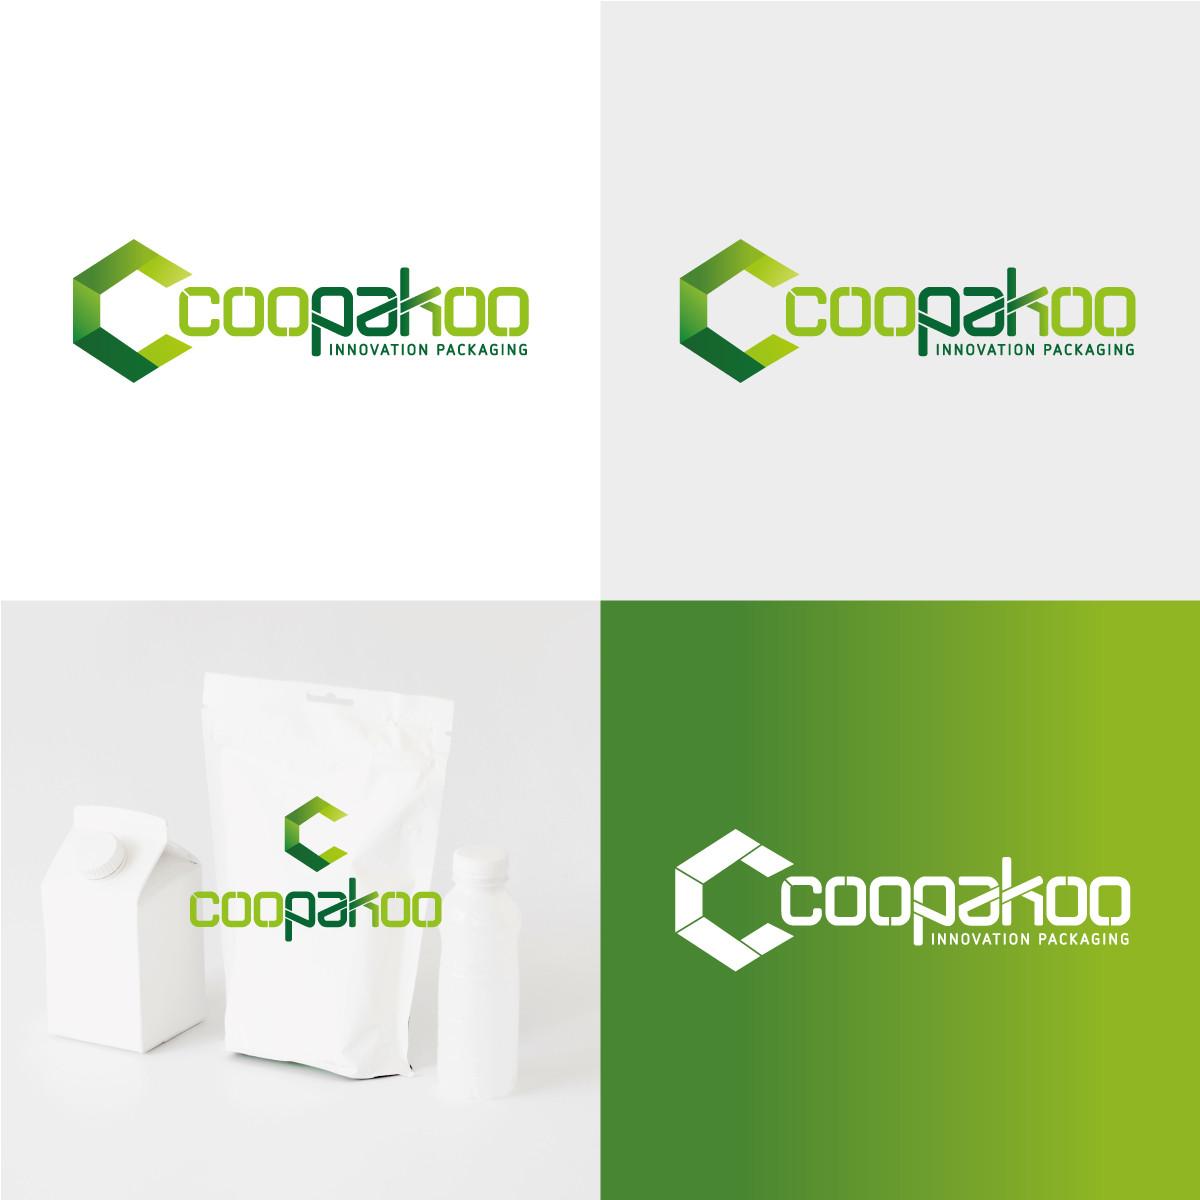 Coopakoo